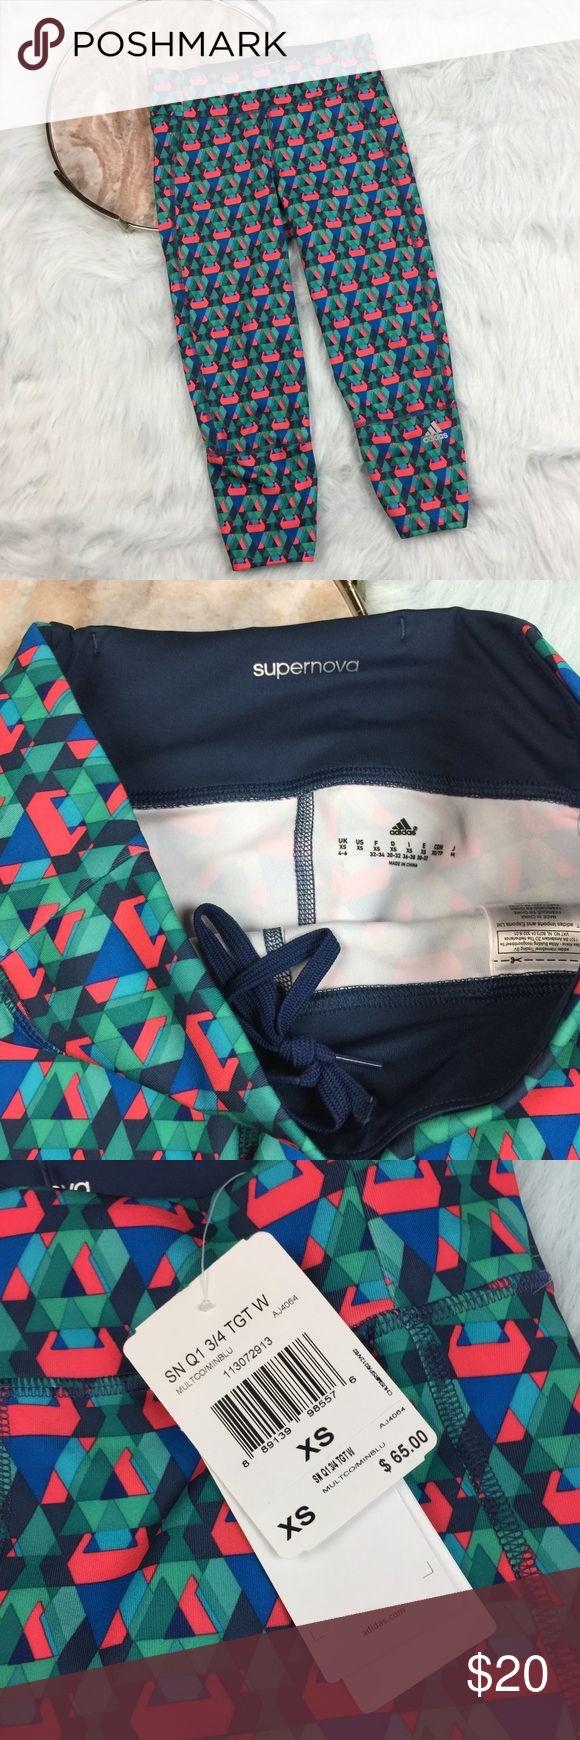 "Fun print adidas supernova running capri leggings Adidas supernova running capris in a fun geometric print. Women's size XS, gently used with no flaws.   waist laying flat- 13"" rise-10""  inseam-  21"" Adidas Pants Leggings"